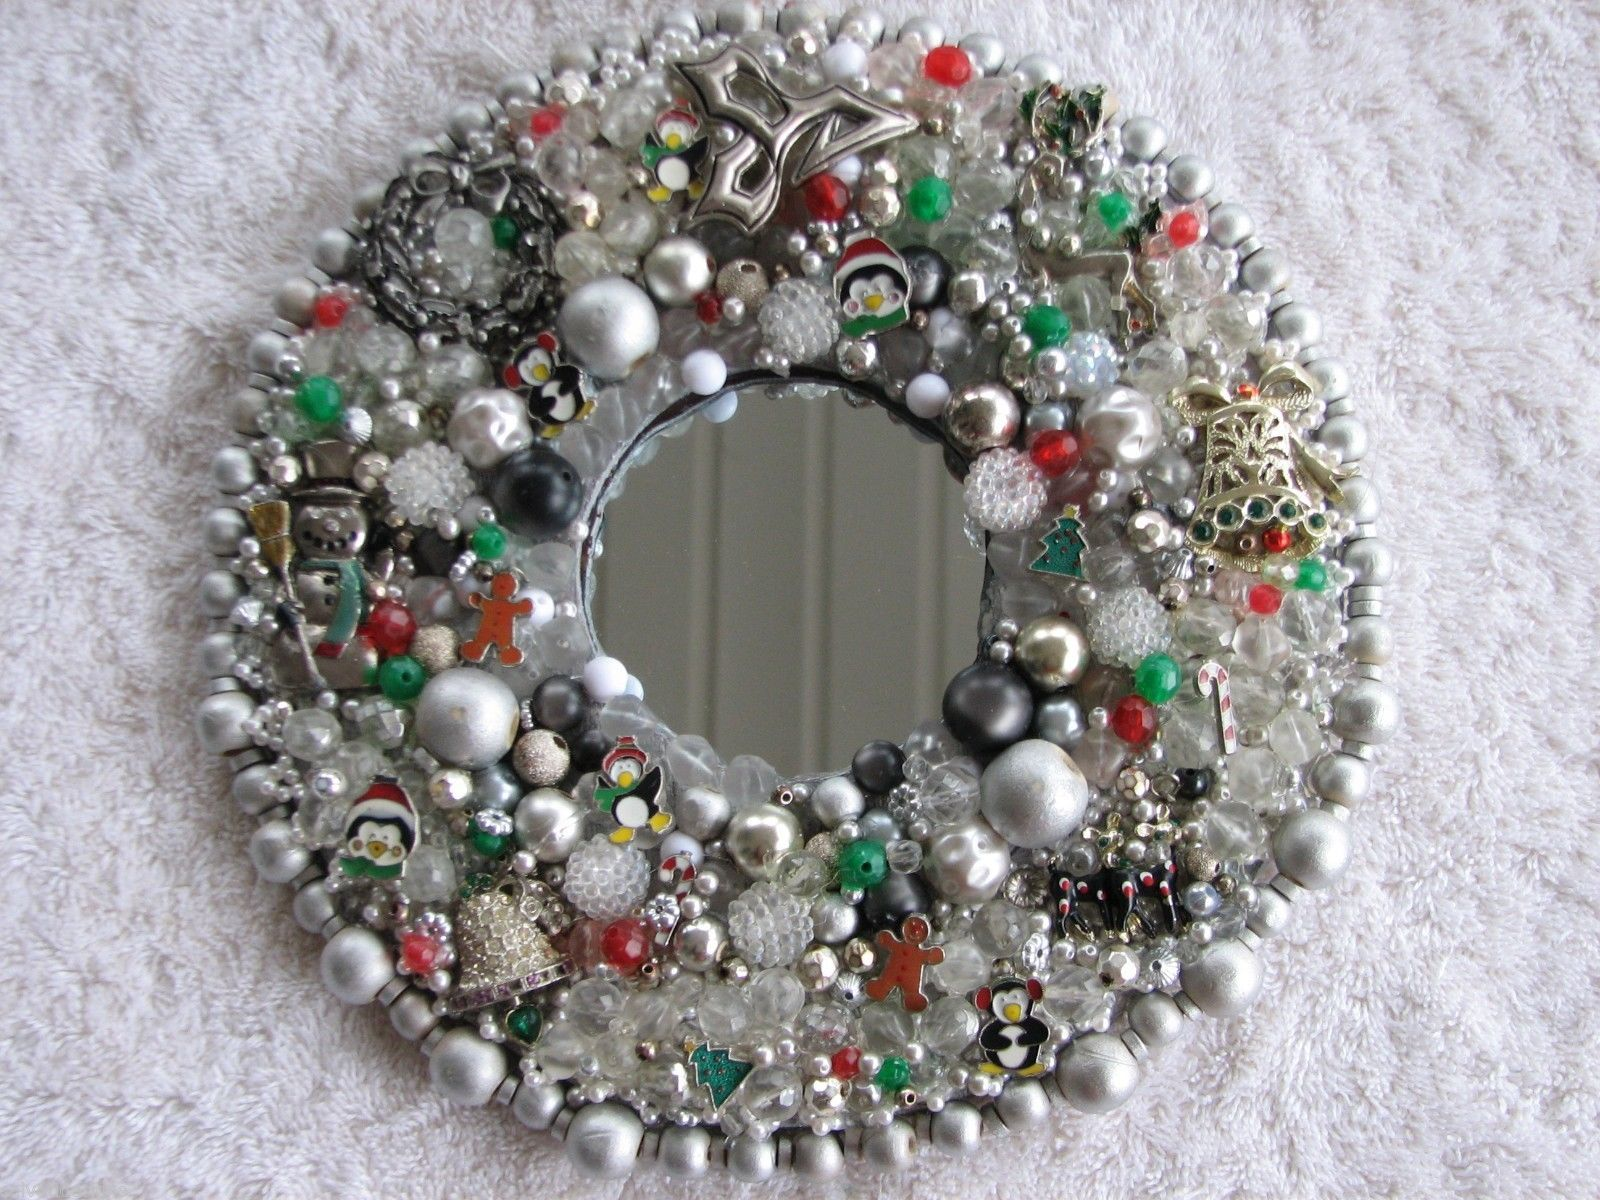 Holly Mirrored Christmas Wreath Decor Art Upcycled Vintage Mod Jewelry | eBay